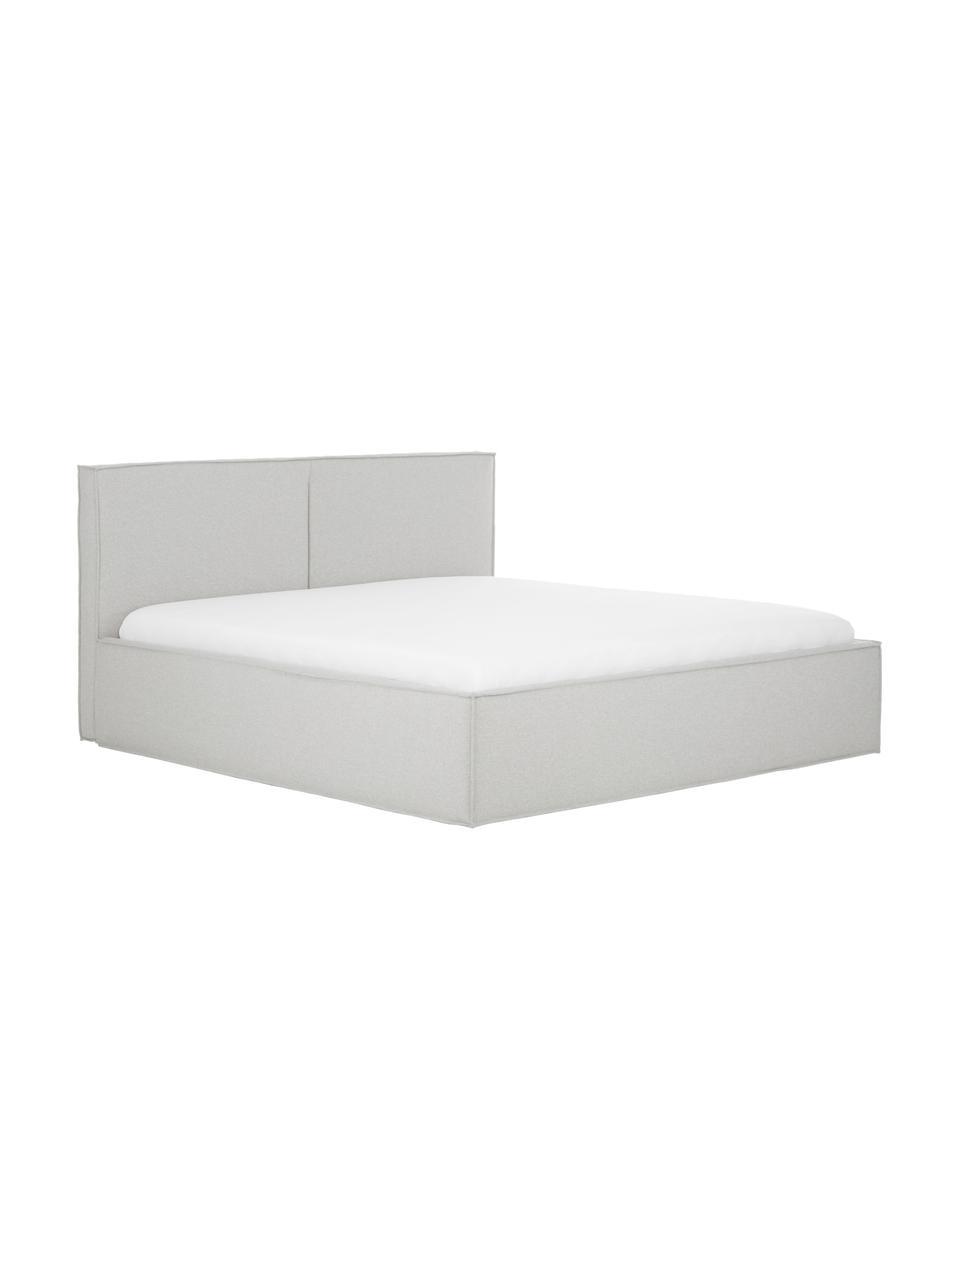 Gestoffeerd bed Dream met opbergruimte in lichtgrijs, Frame: massief grenenhout en pla, Bekleding: 100% polyester (gestructu, Geweven stof lichtgrijs, 180 x 200 cm